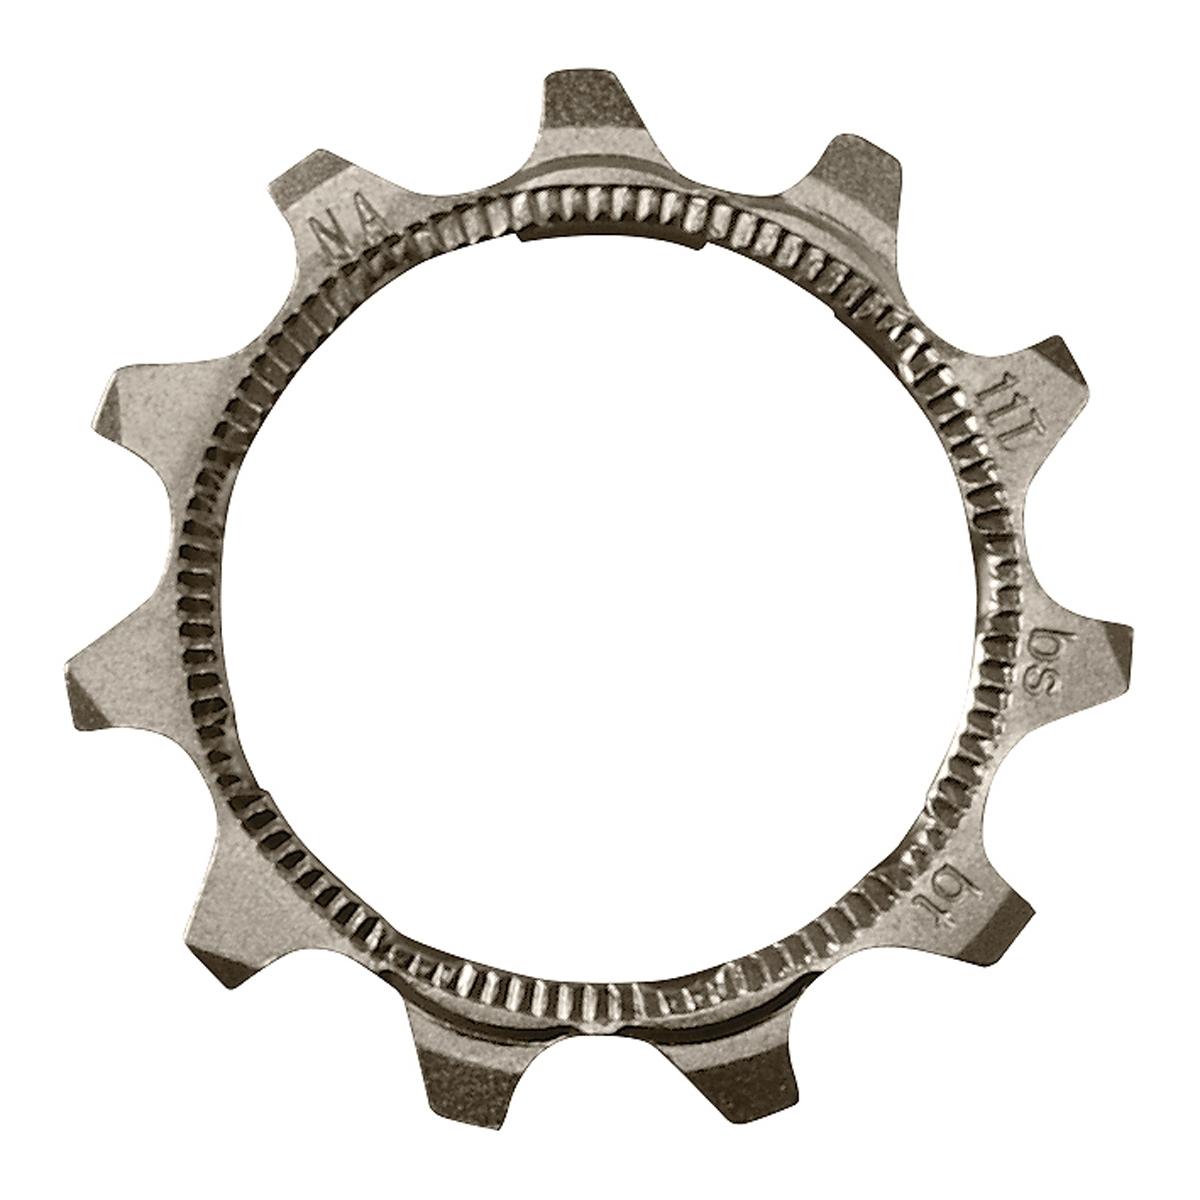 Shimano tandhjul 11T CS-M8000 - Y1RK11000 | Freewheels